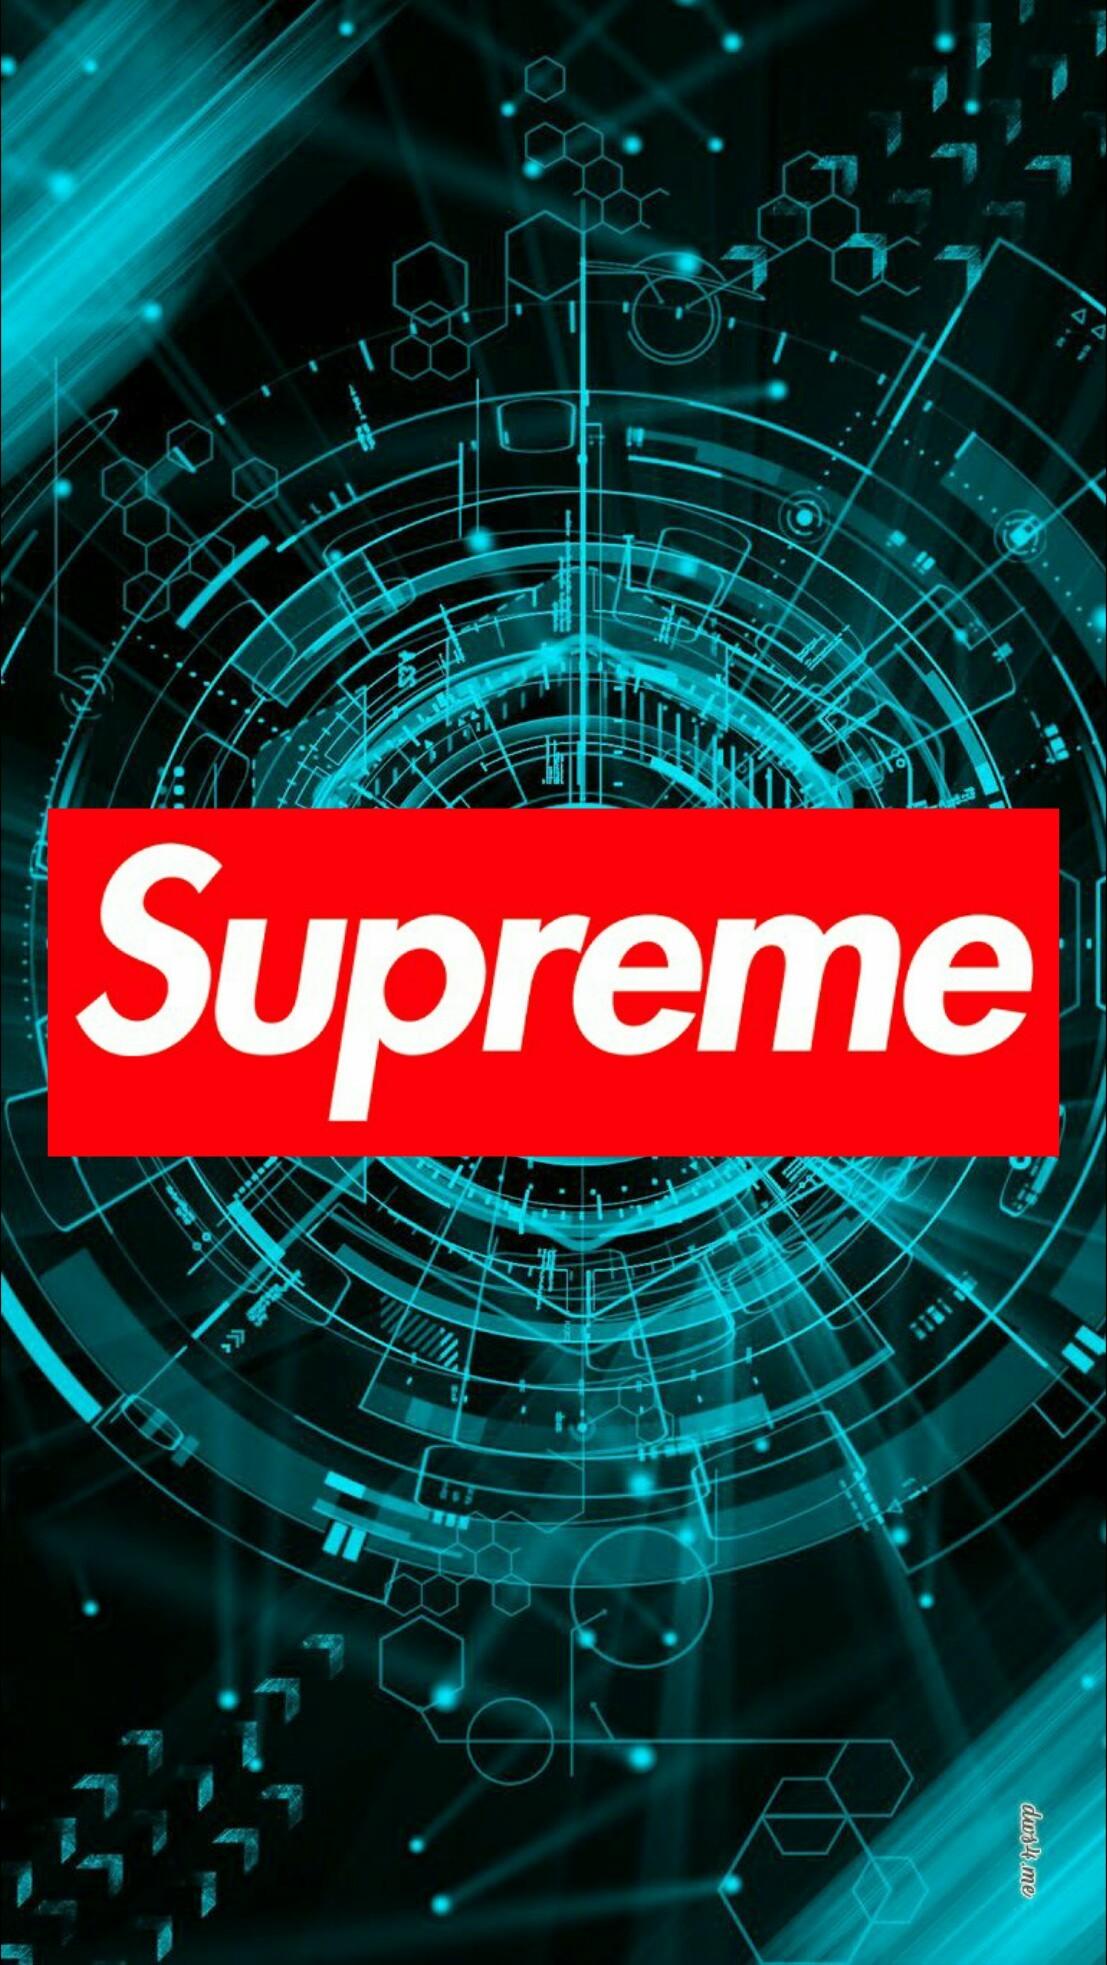 Supreme wallpaper ·① Download free High Resolution ...